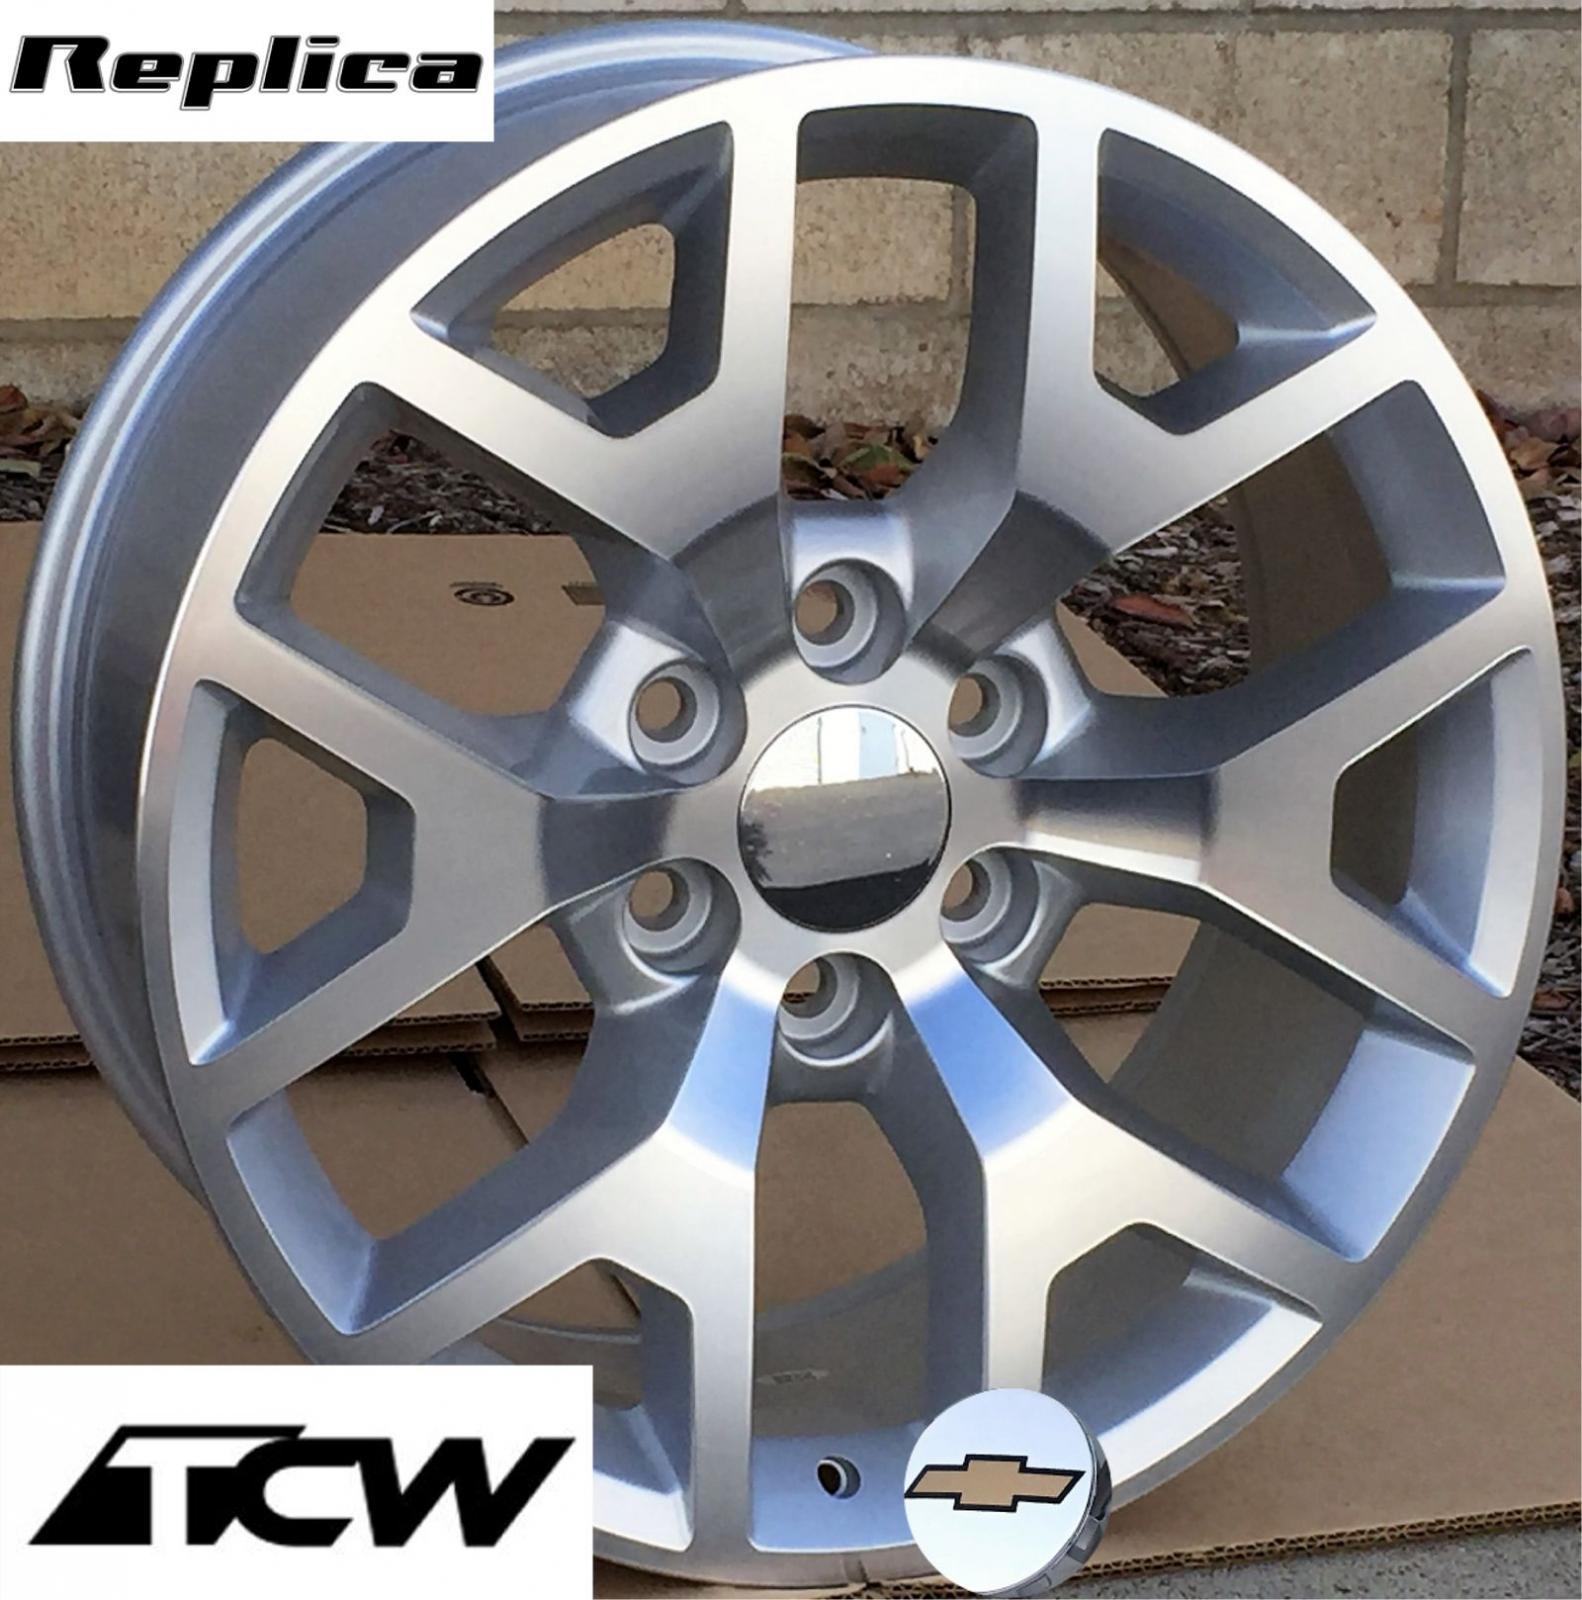 50 Inch Rims On Chevy : Inch quot gmc sierra oe replica wheels rims silver